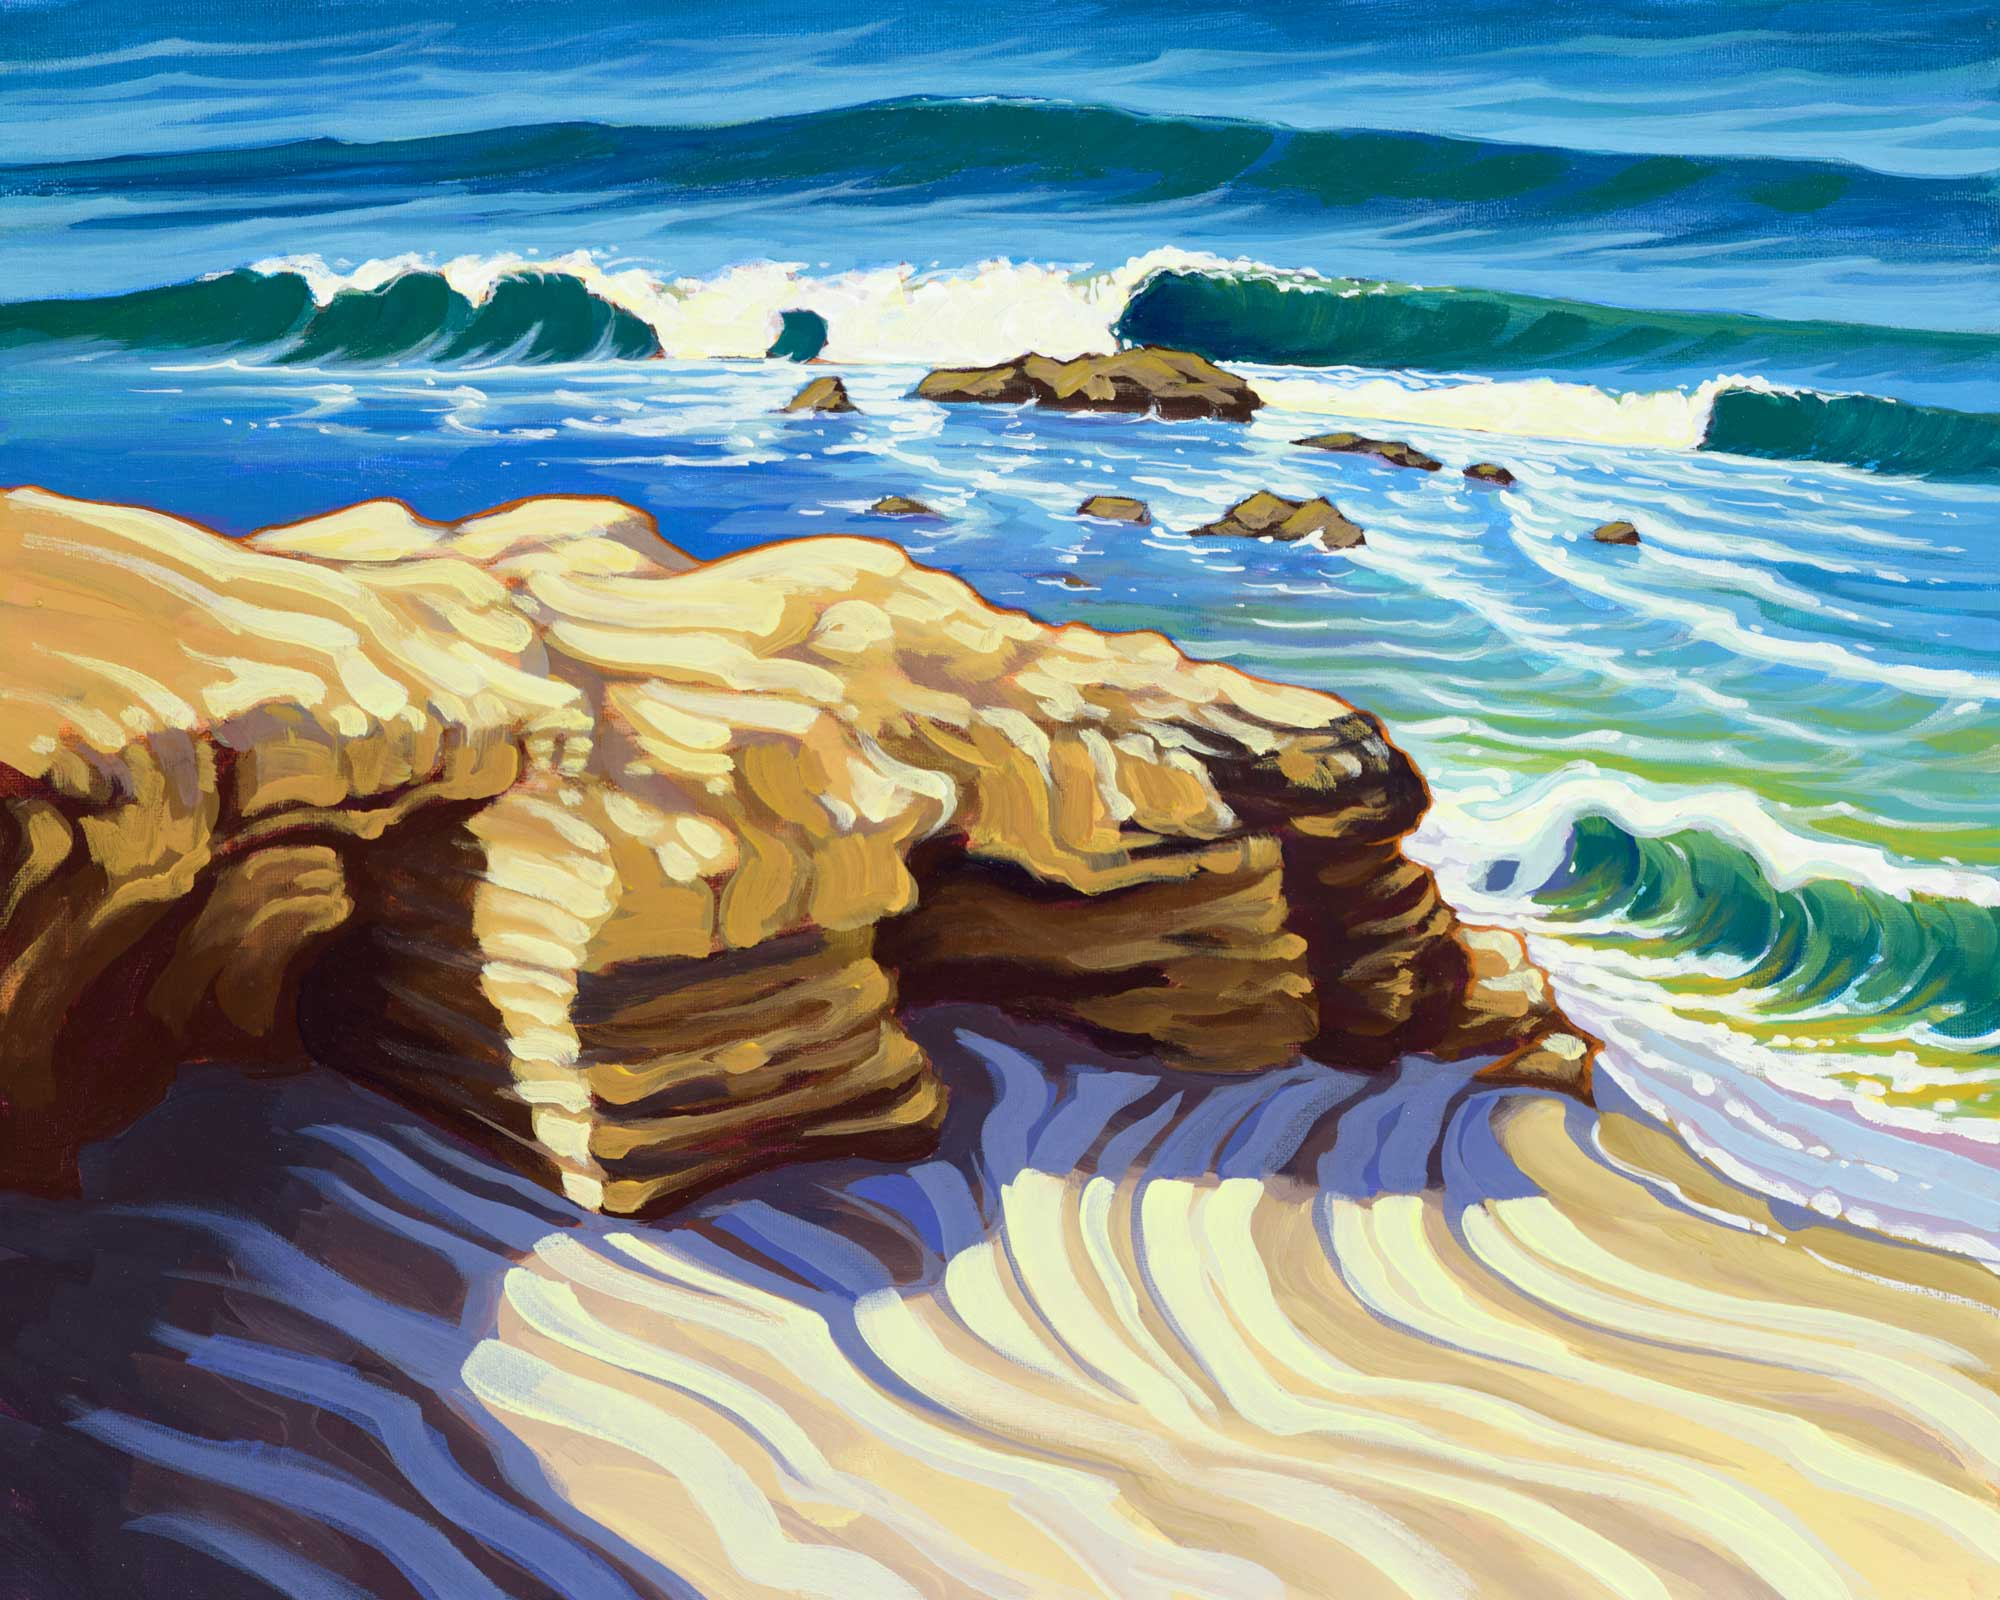 Plein air artwork from the beach near windansea on the la jolla coast of san diego in southern california